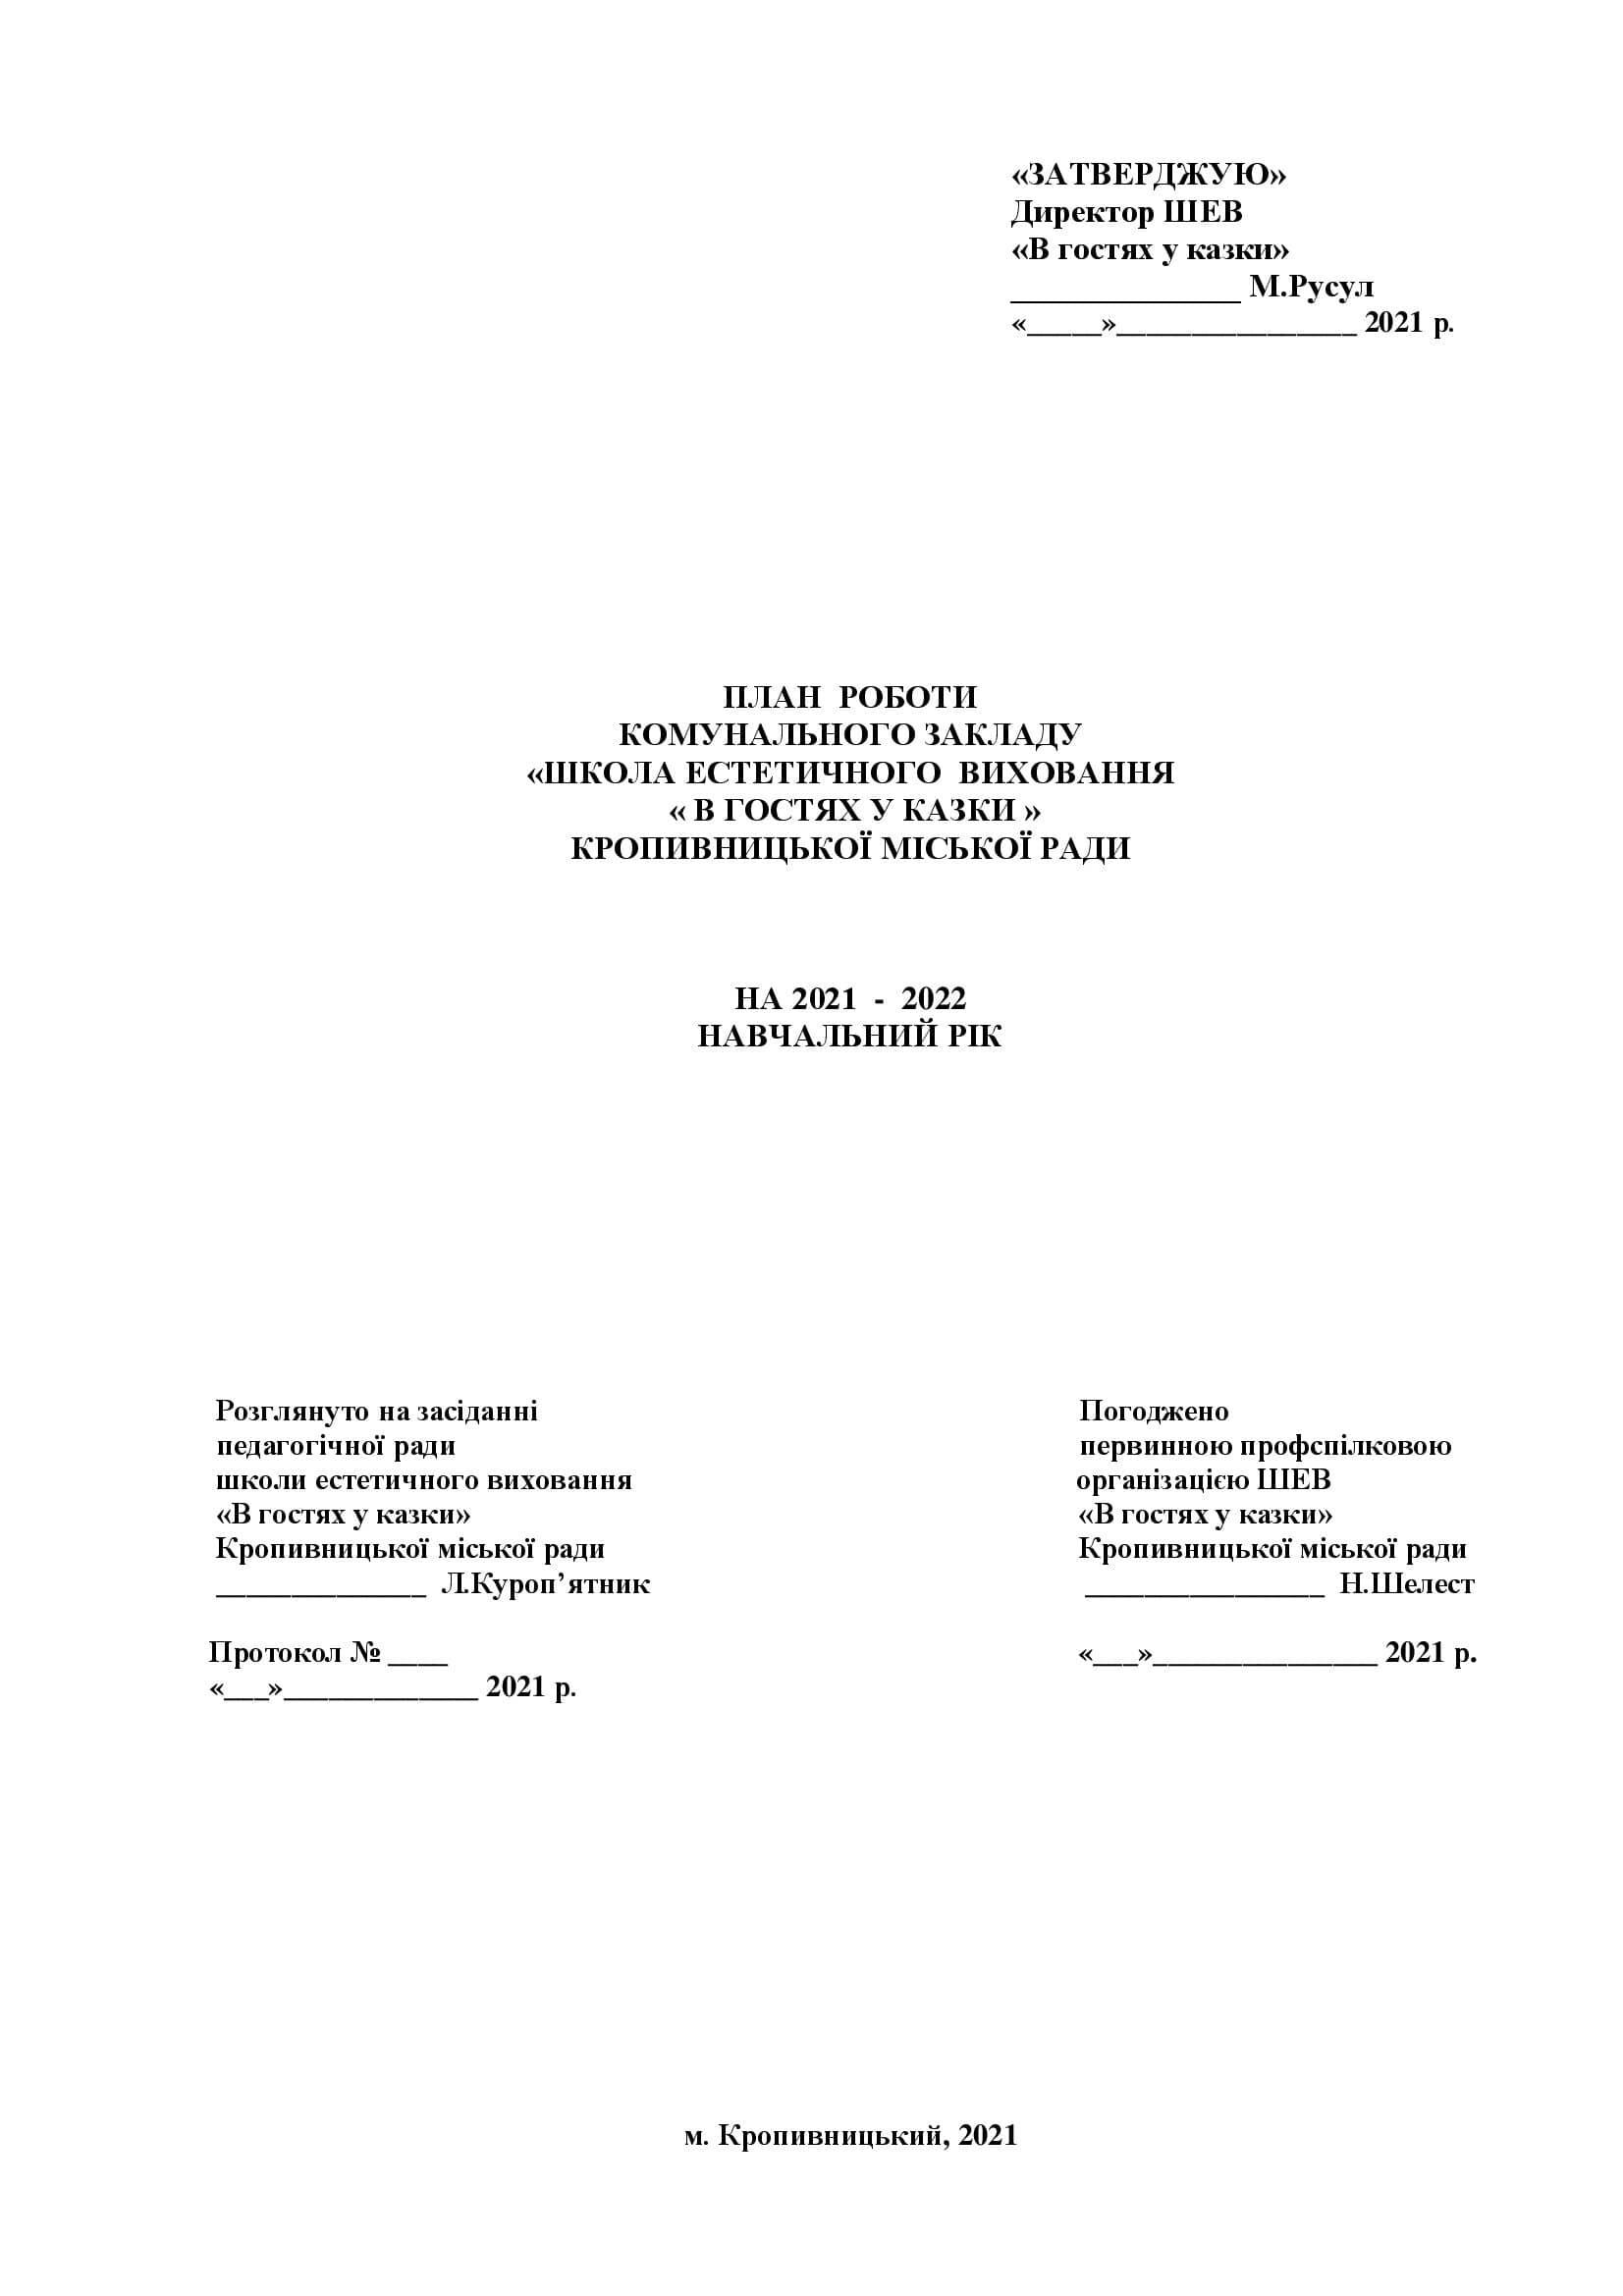 План роботи ШЕВ В гостях у казки  2021-2022_00001